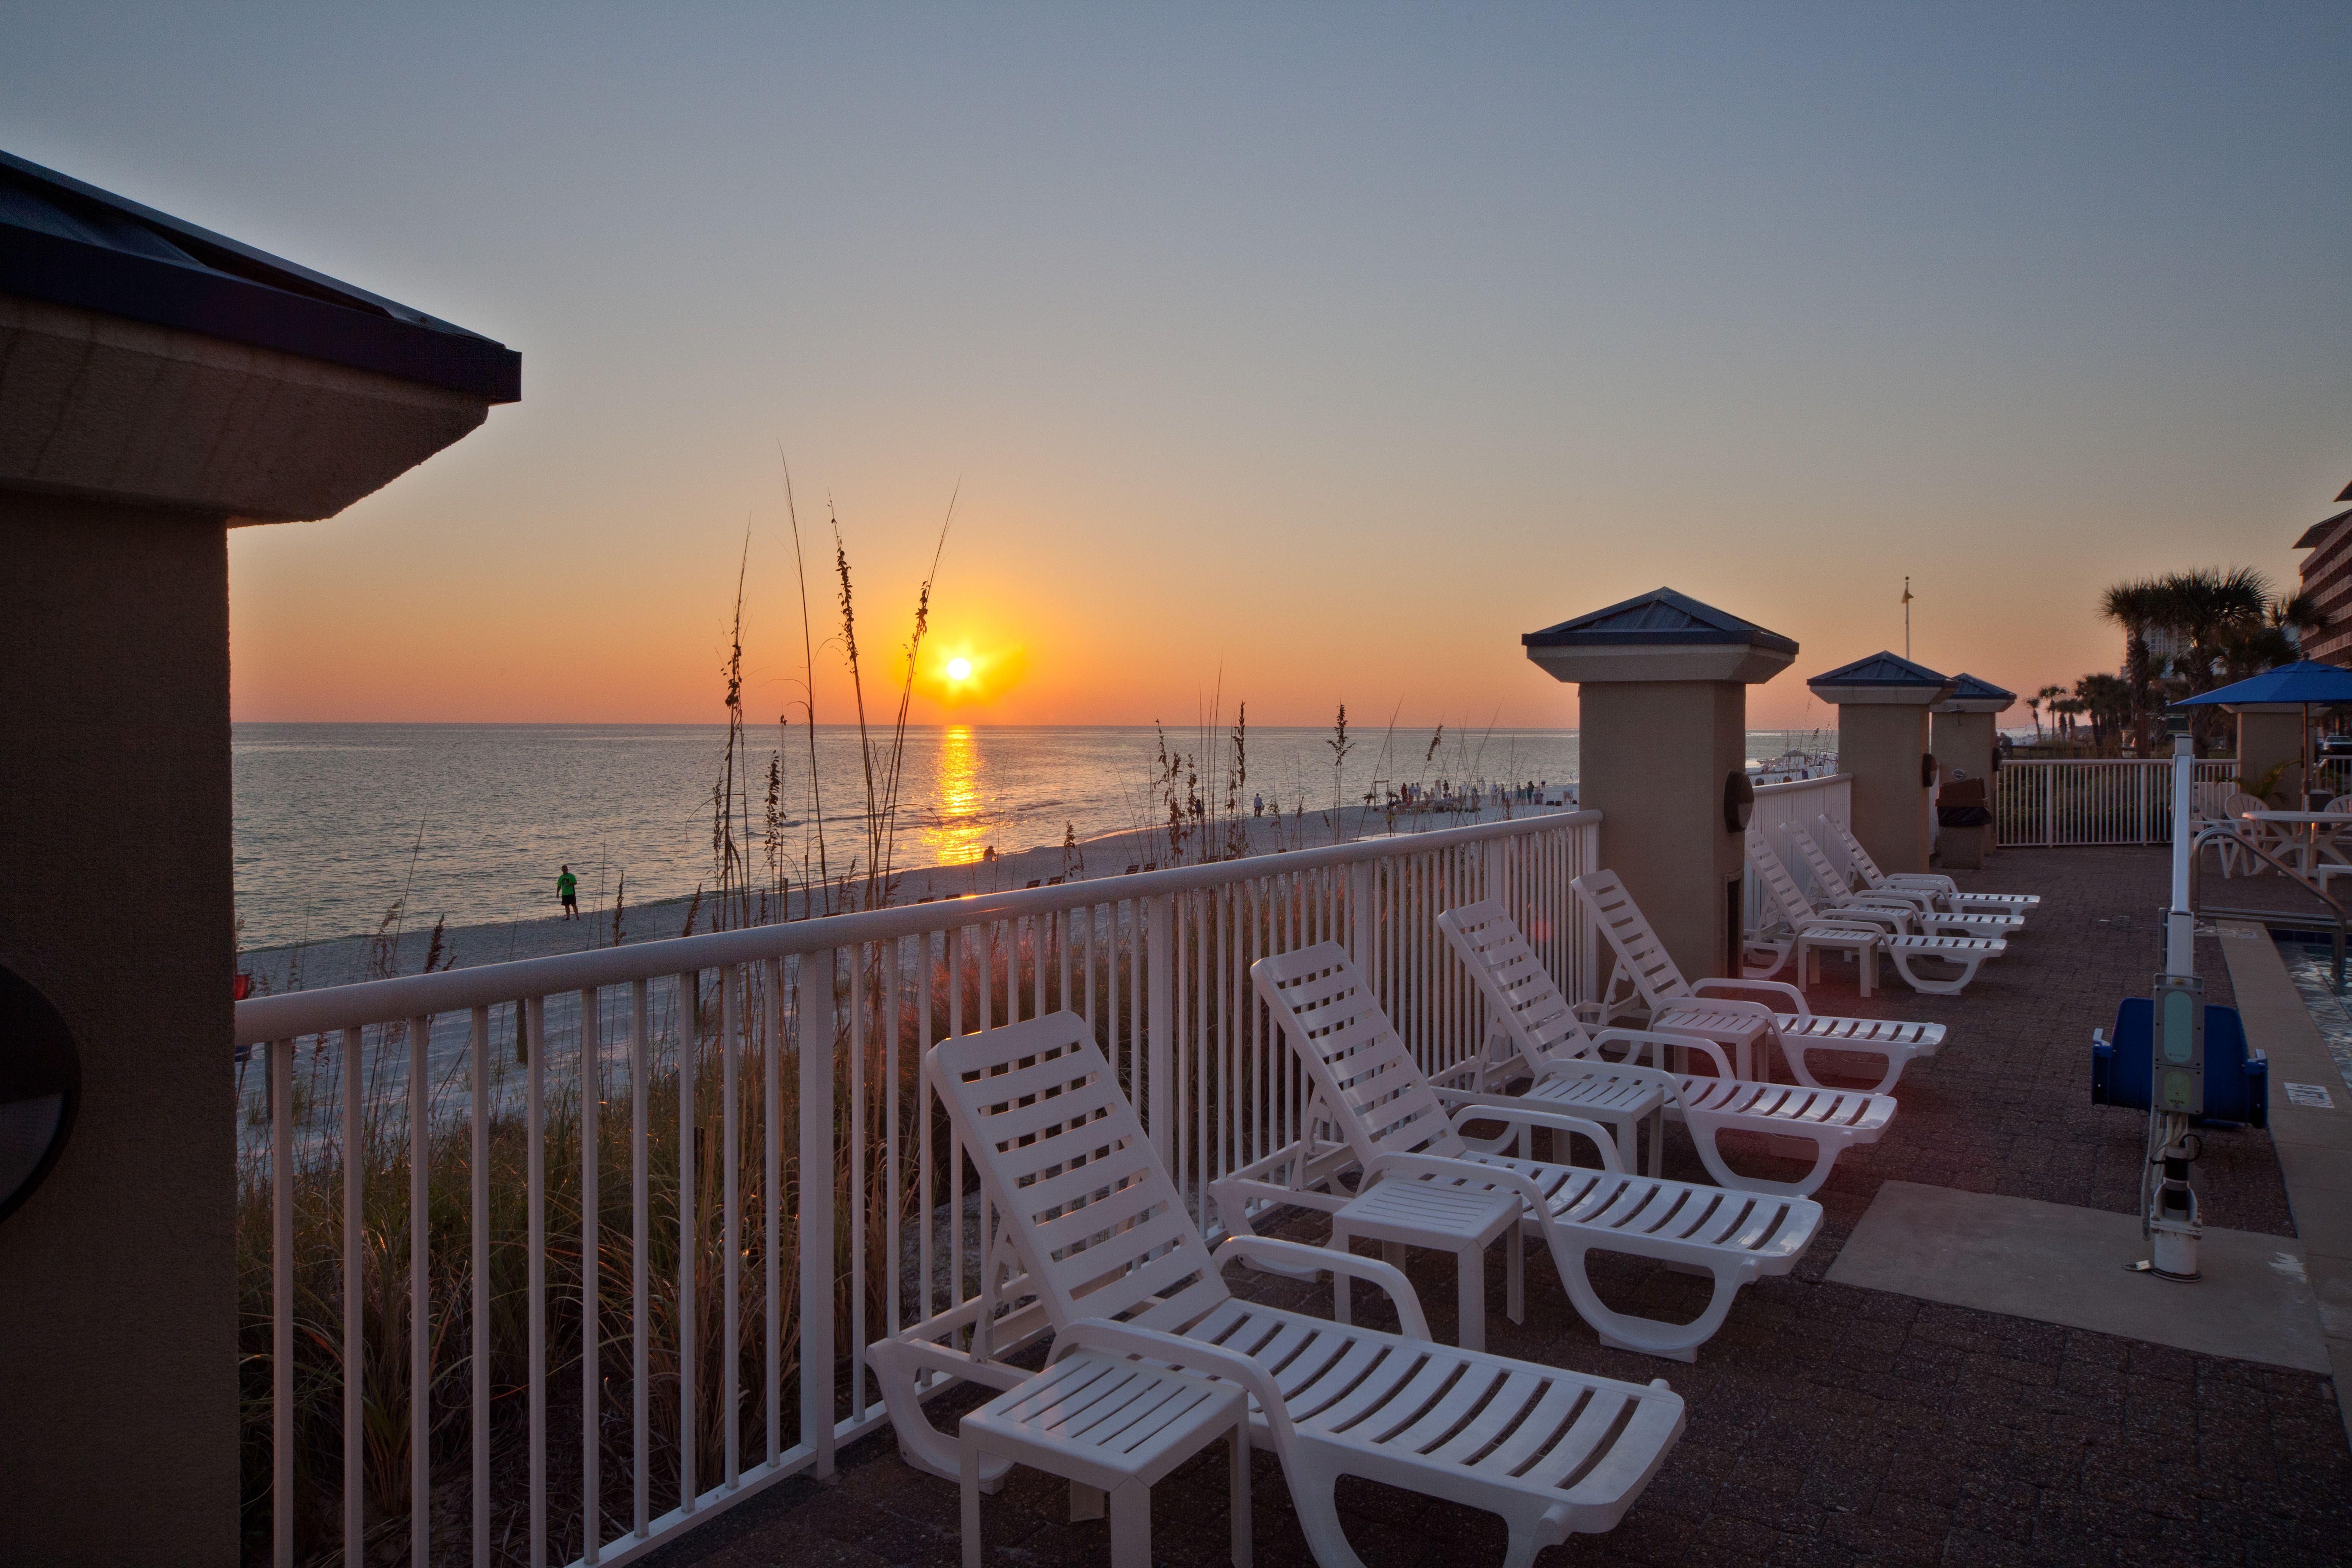 Pin By Holiday Inn Club Vacations On Panama City Beach Resort Panama City Beach Resorts Panama City Beach Panama City Beach Florida